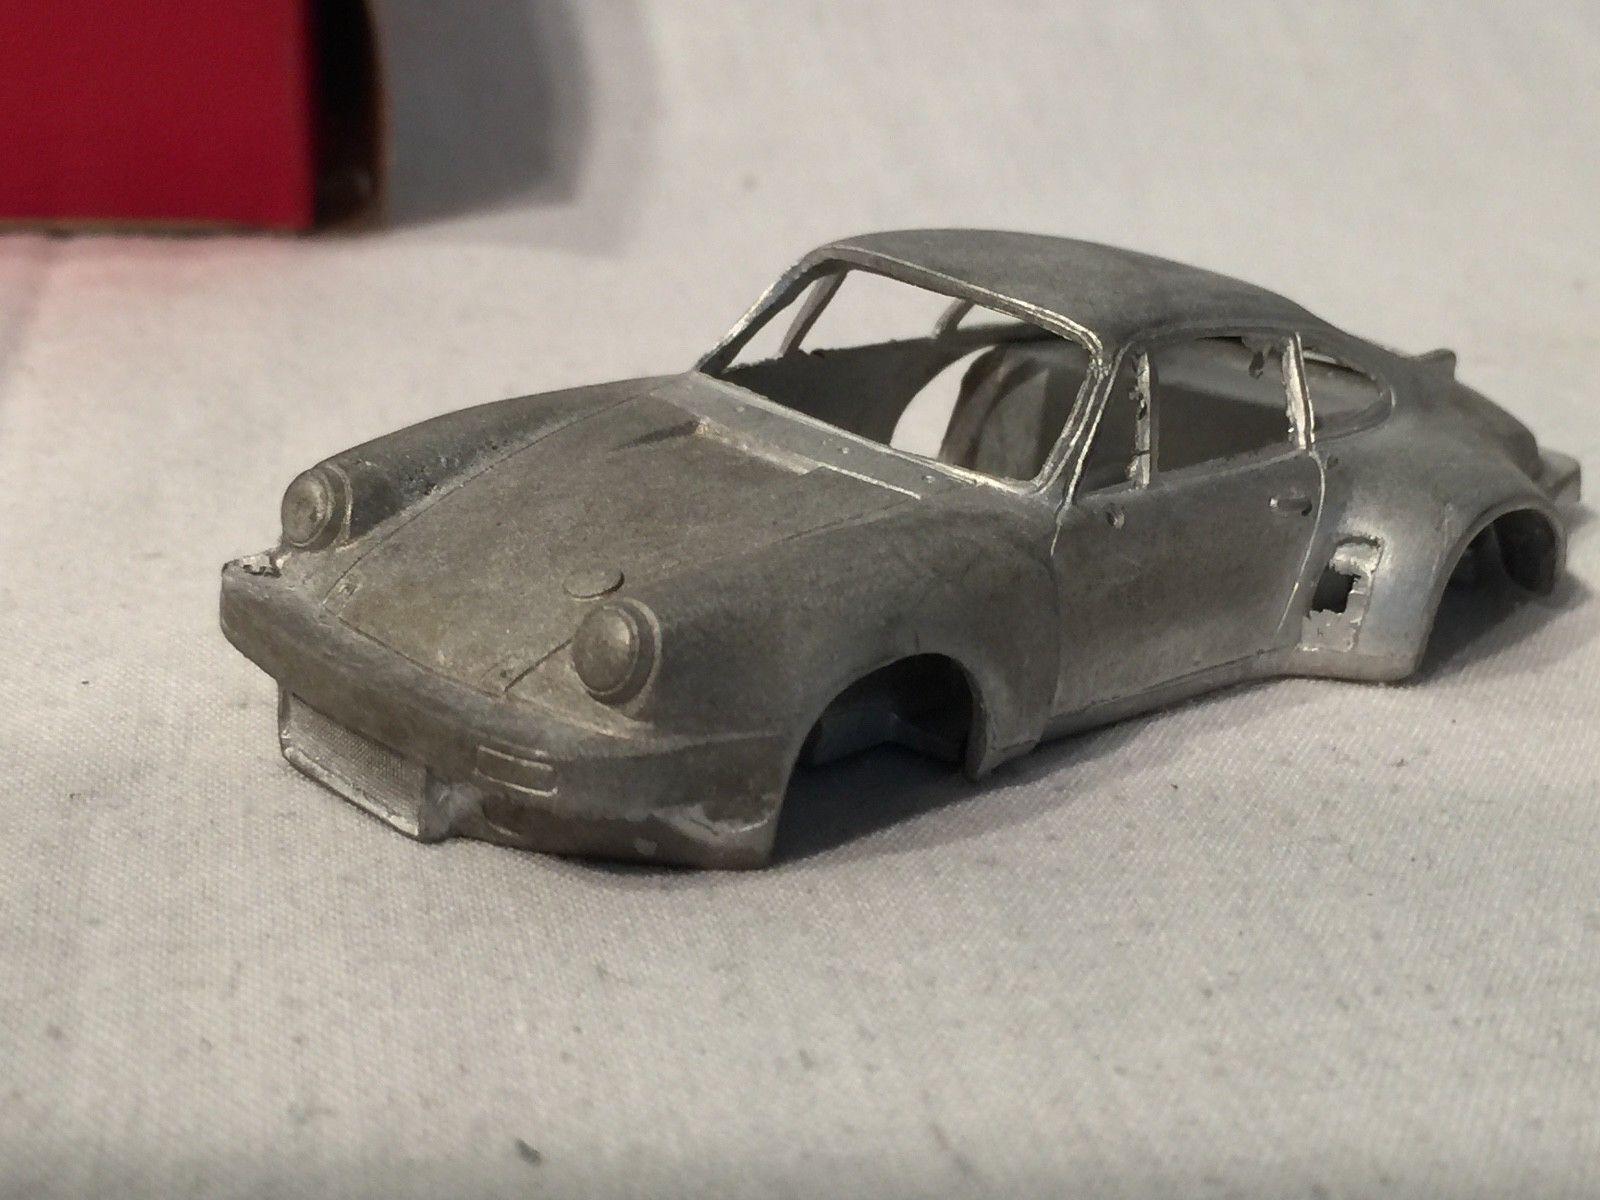 Porsche Carrera RSR 3 litros Grand Prix Modelos die cast metal Kit Vintage Inglaterra